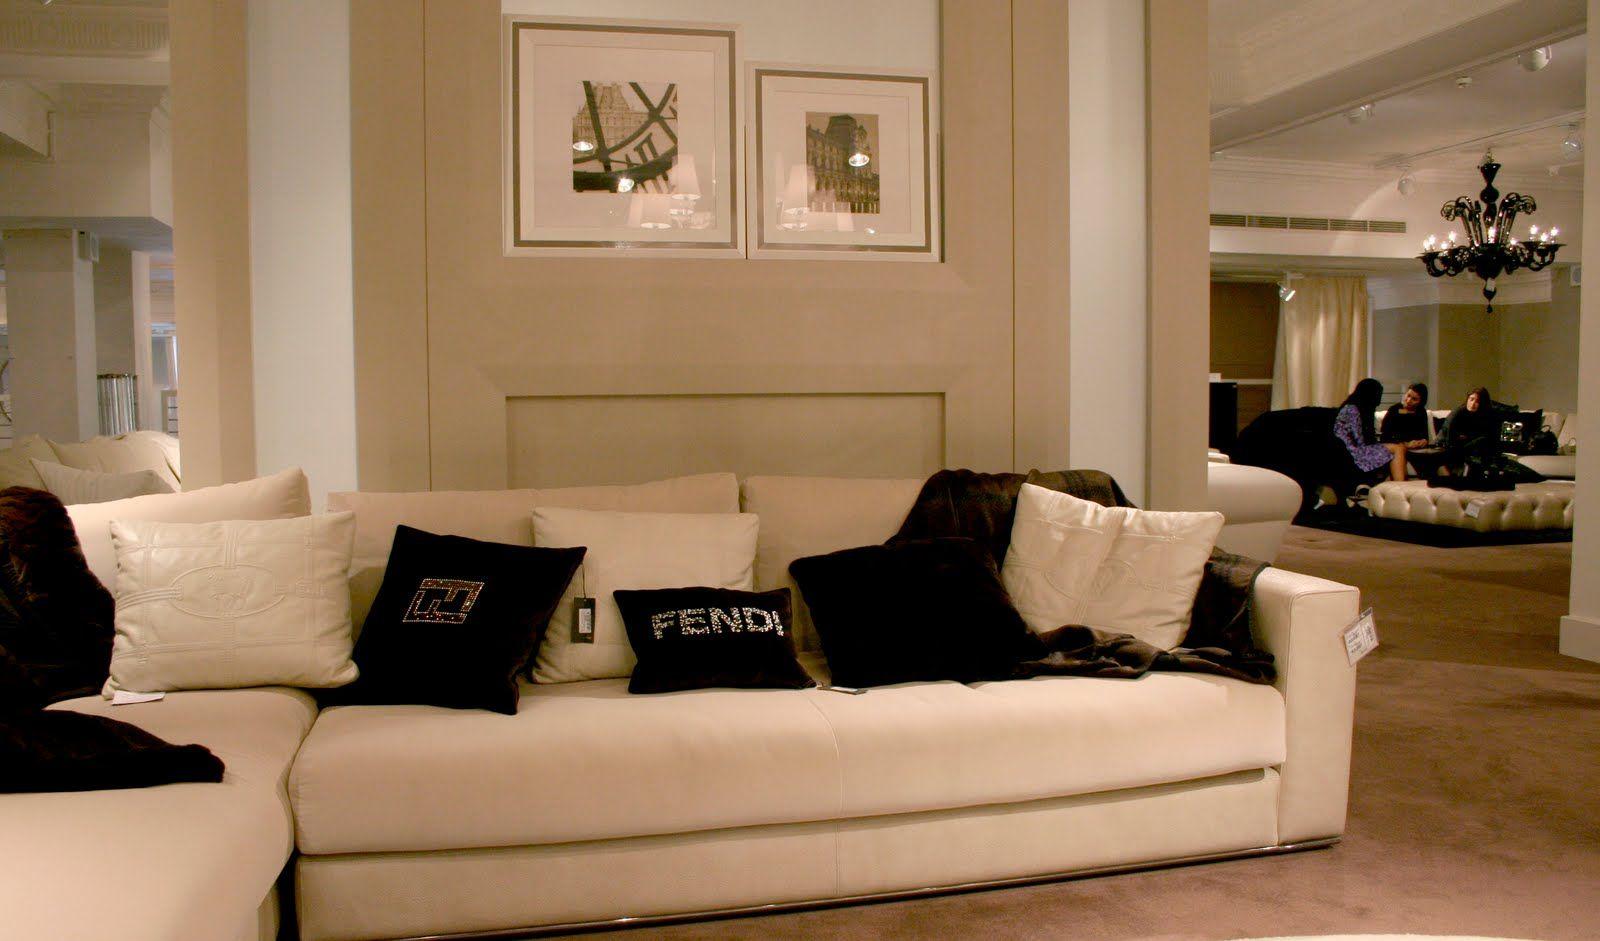 Fendi Furniture Catalogue   Top 10 Famous Furniture Brands   Fendi Casa. Fendi Furniture Catalogue   Top 10 Famous Furniture Brands   Fendi